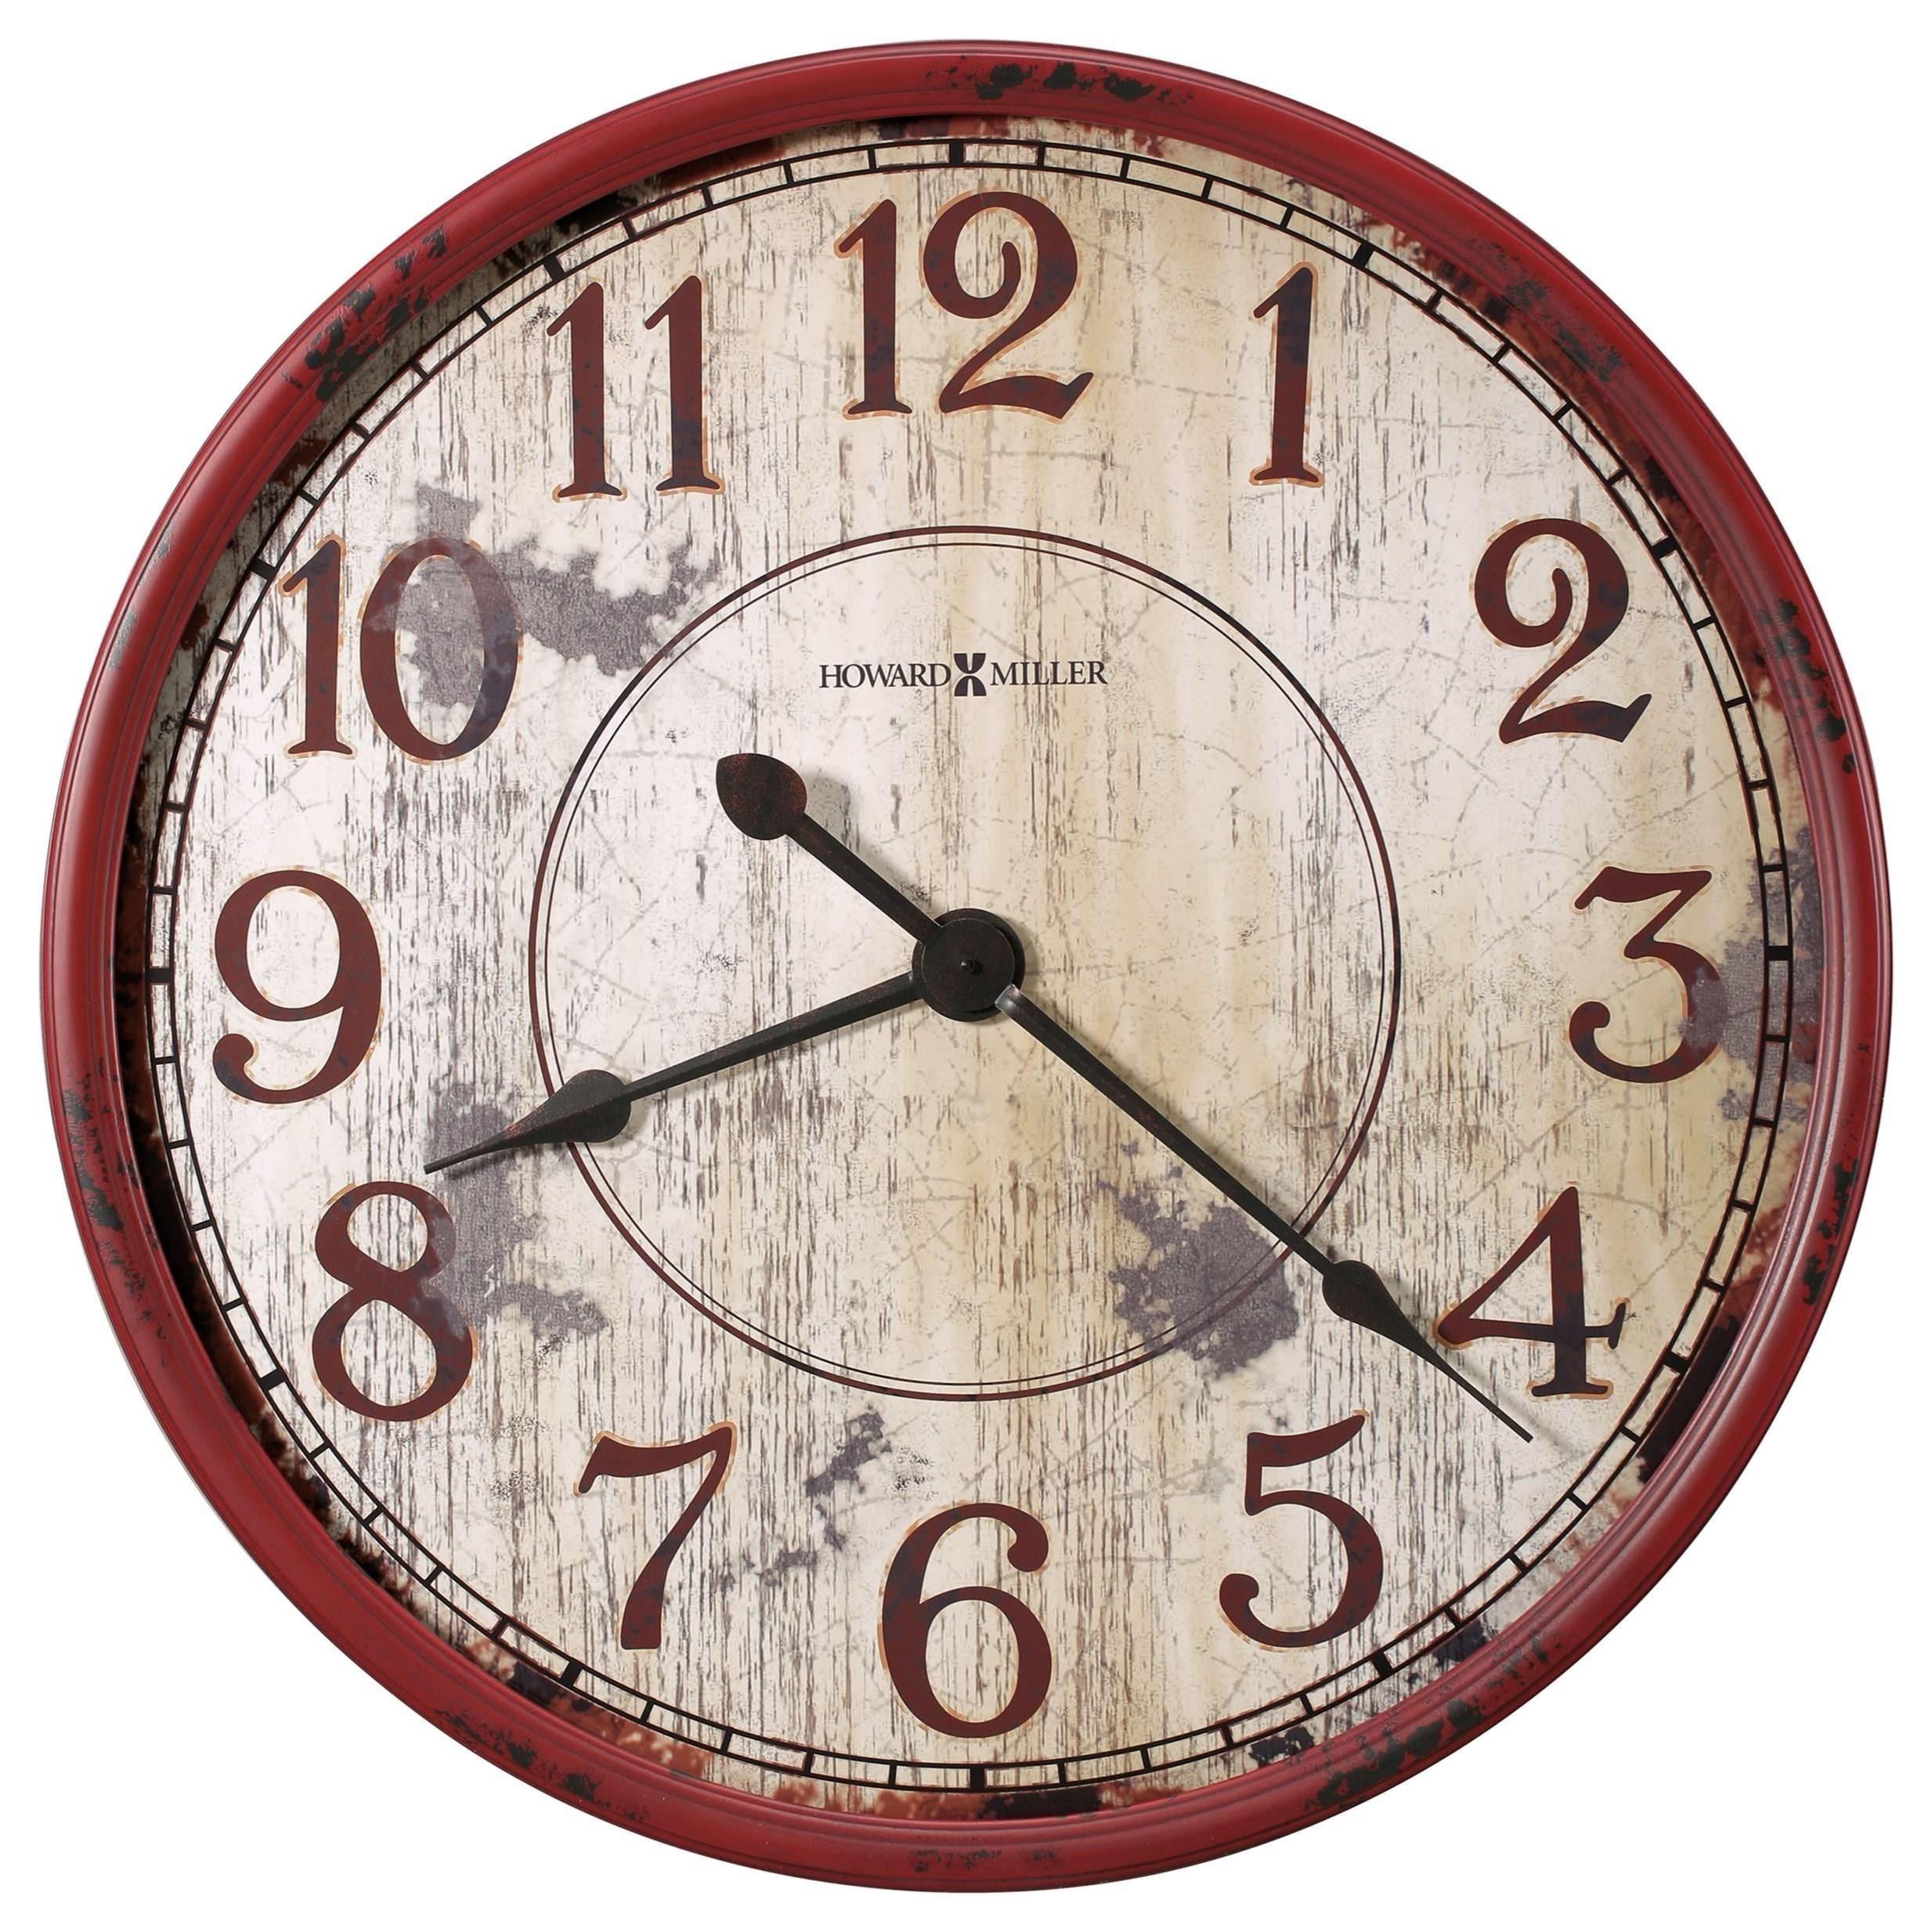 Howard Miller 625-462 Chadwick Gallery Wall Clock